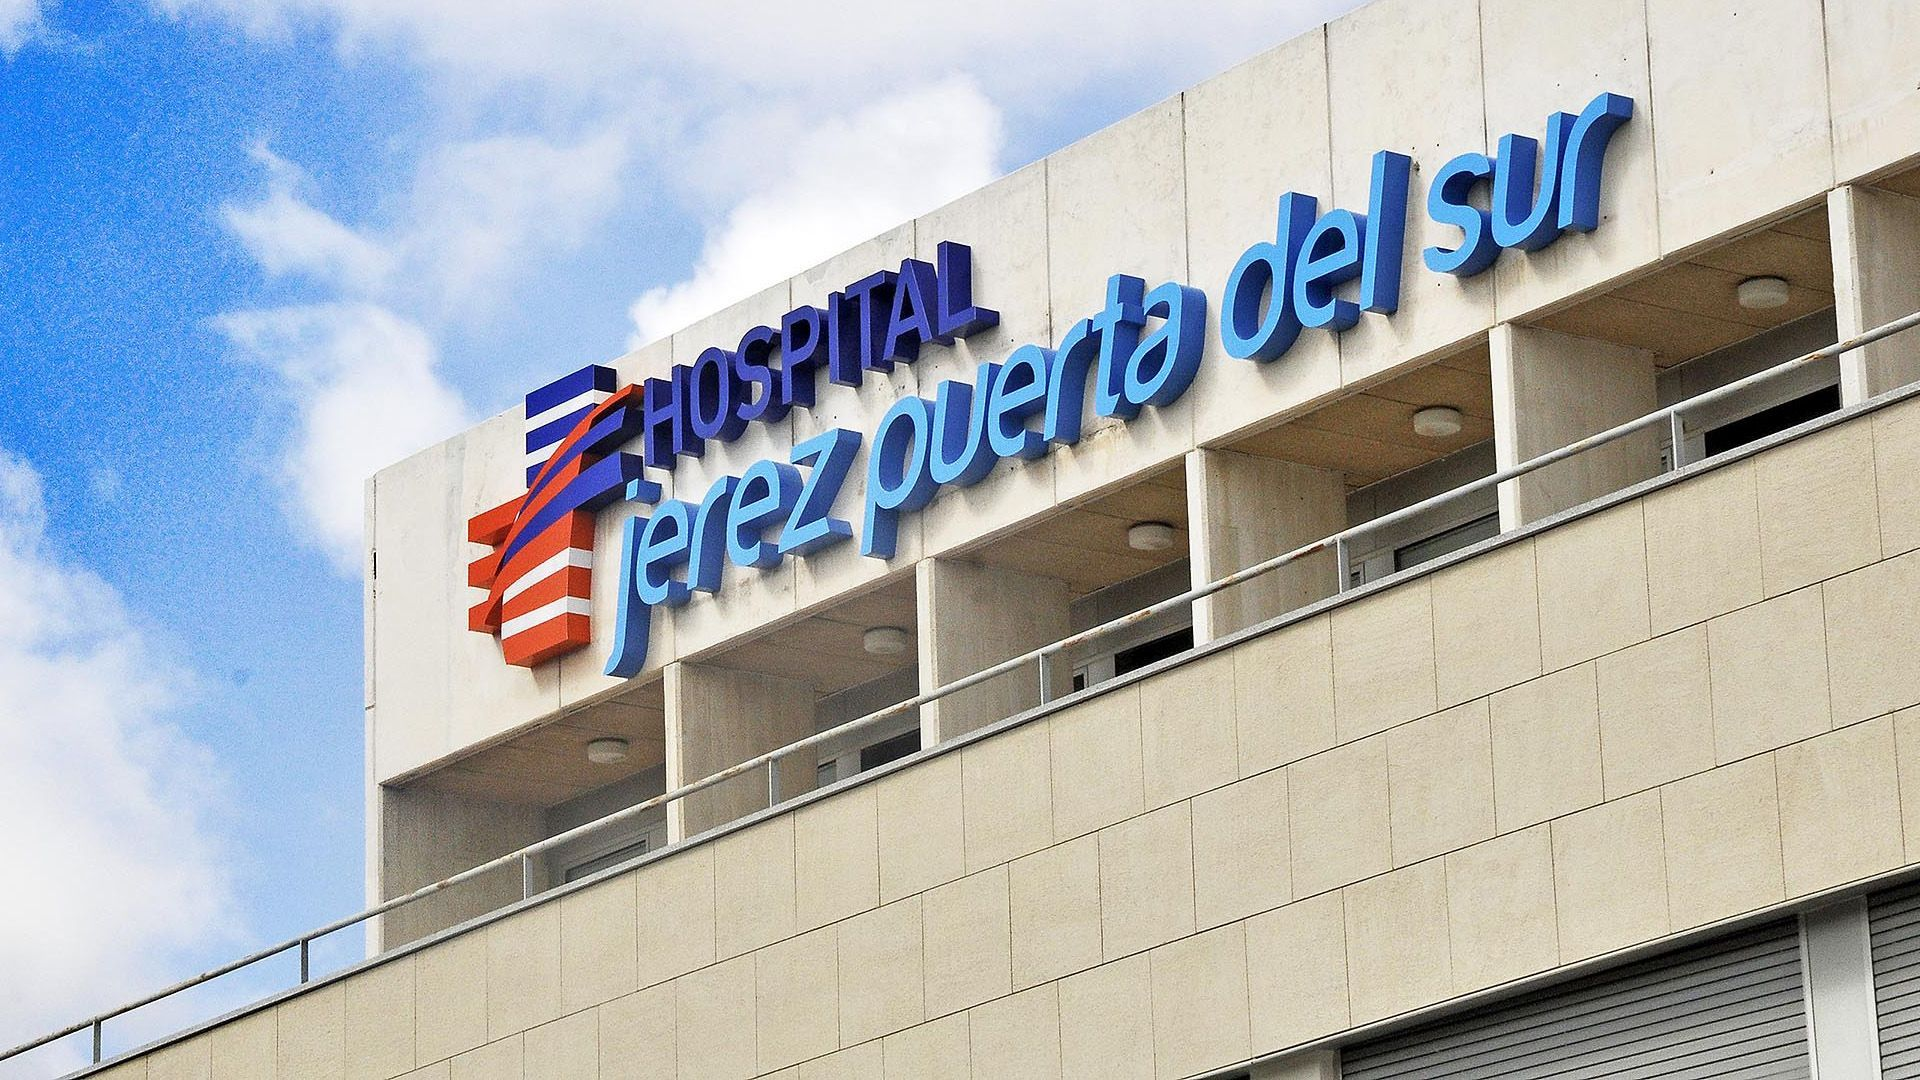 Hospital Jerez Puerta del Sur diagnostica y trata trastornos del neurodesarrollo infantil